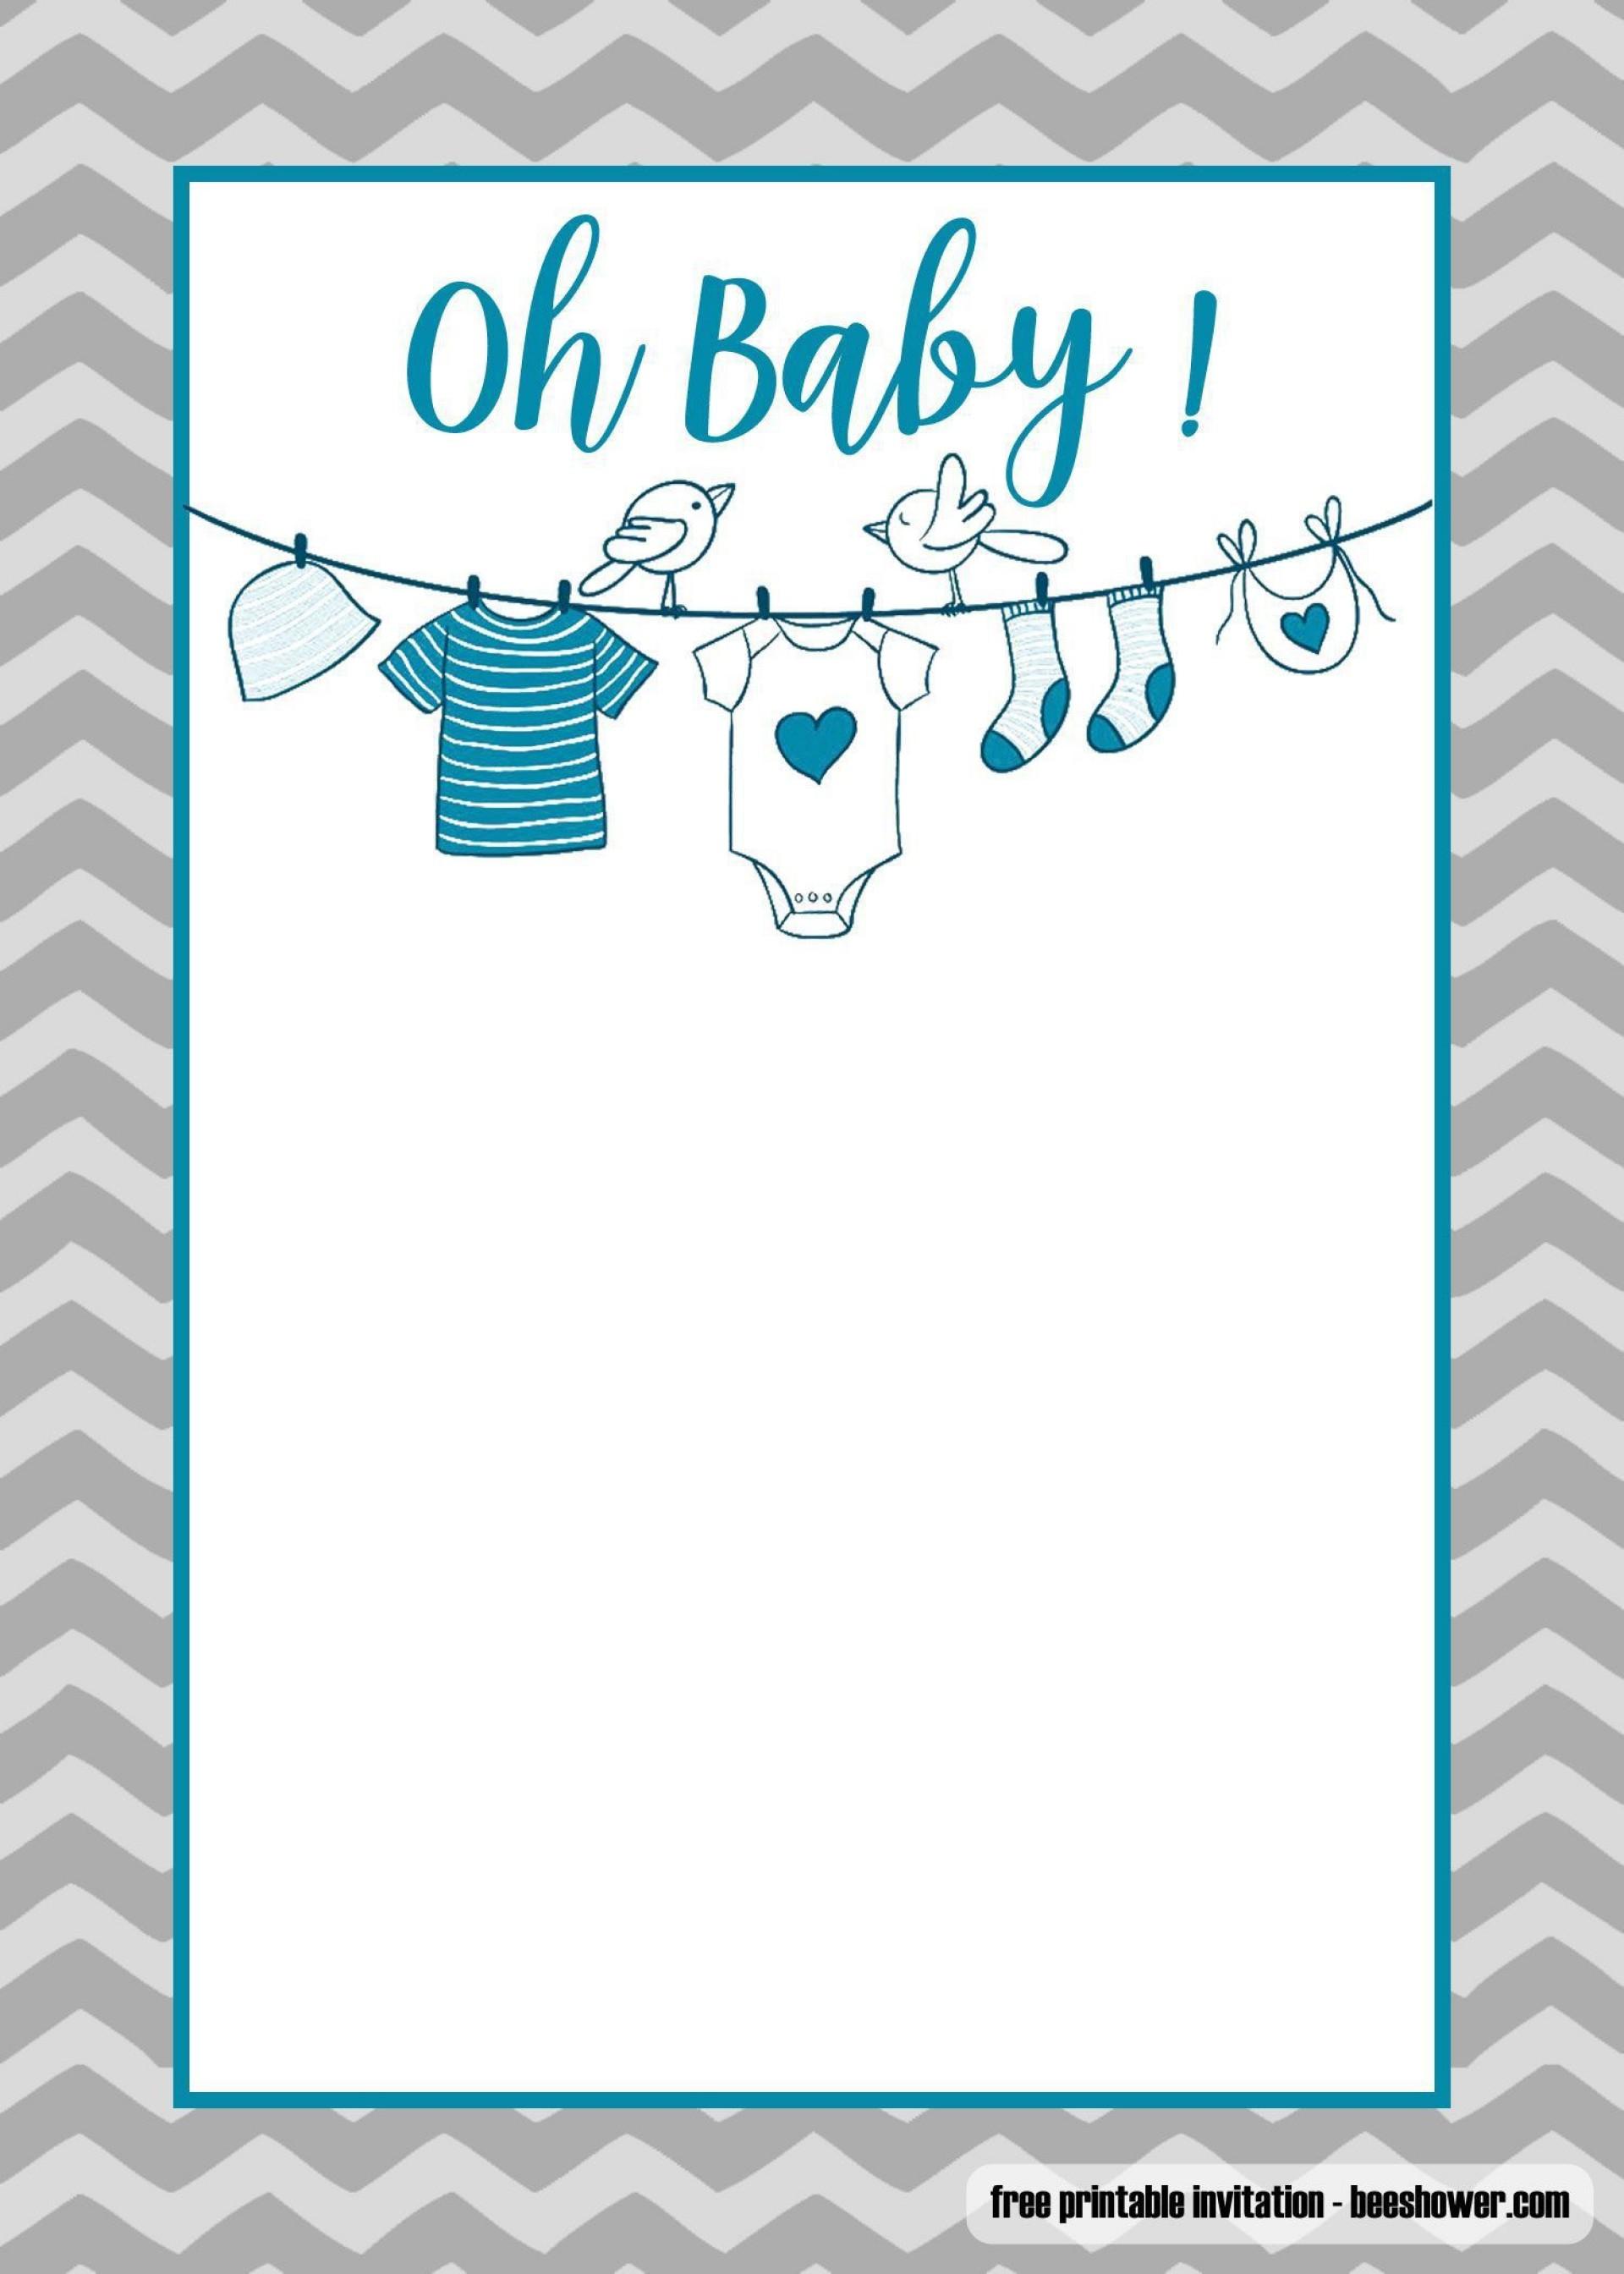 005 Fantastic Baby Shower Invitation Template Microsoft Word Design  Free Editable1920